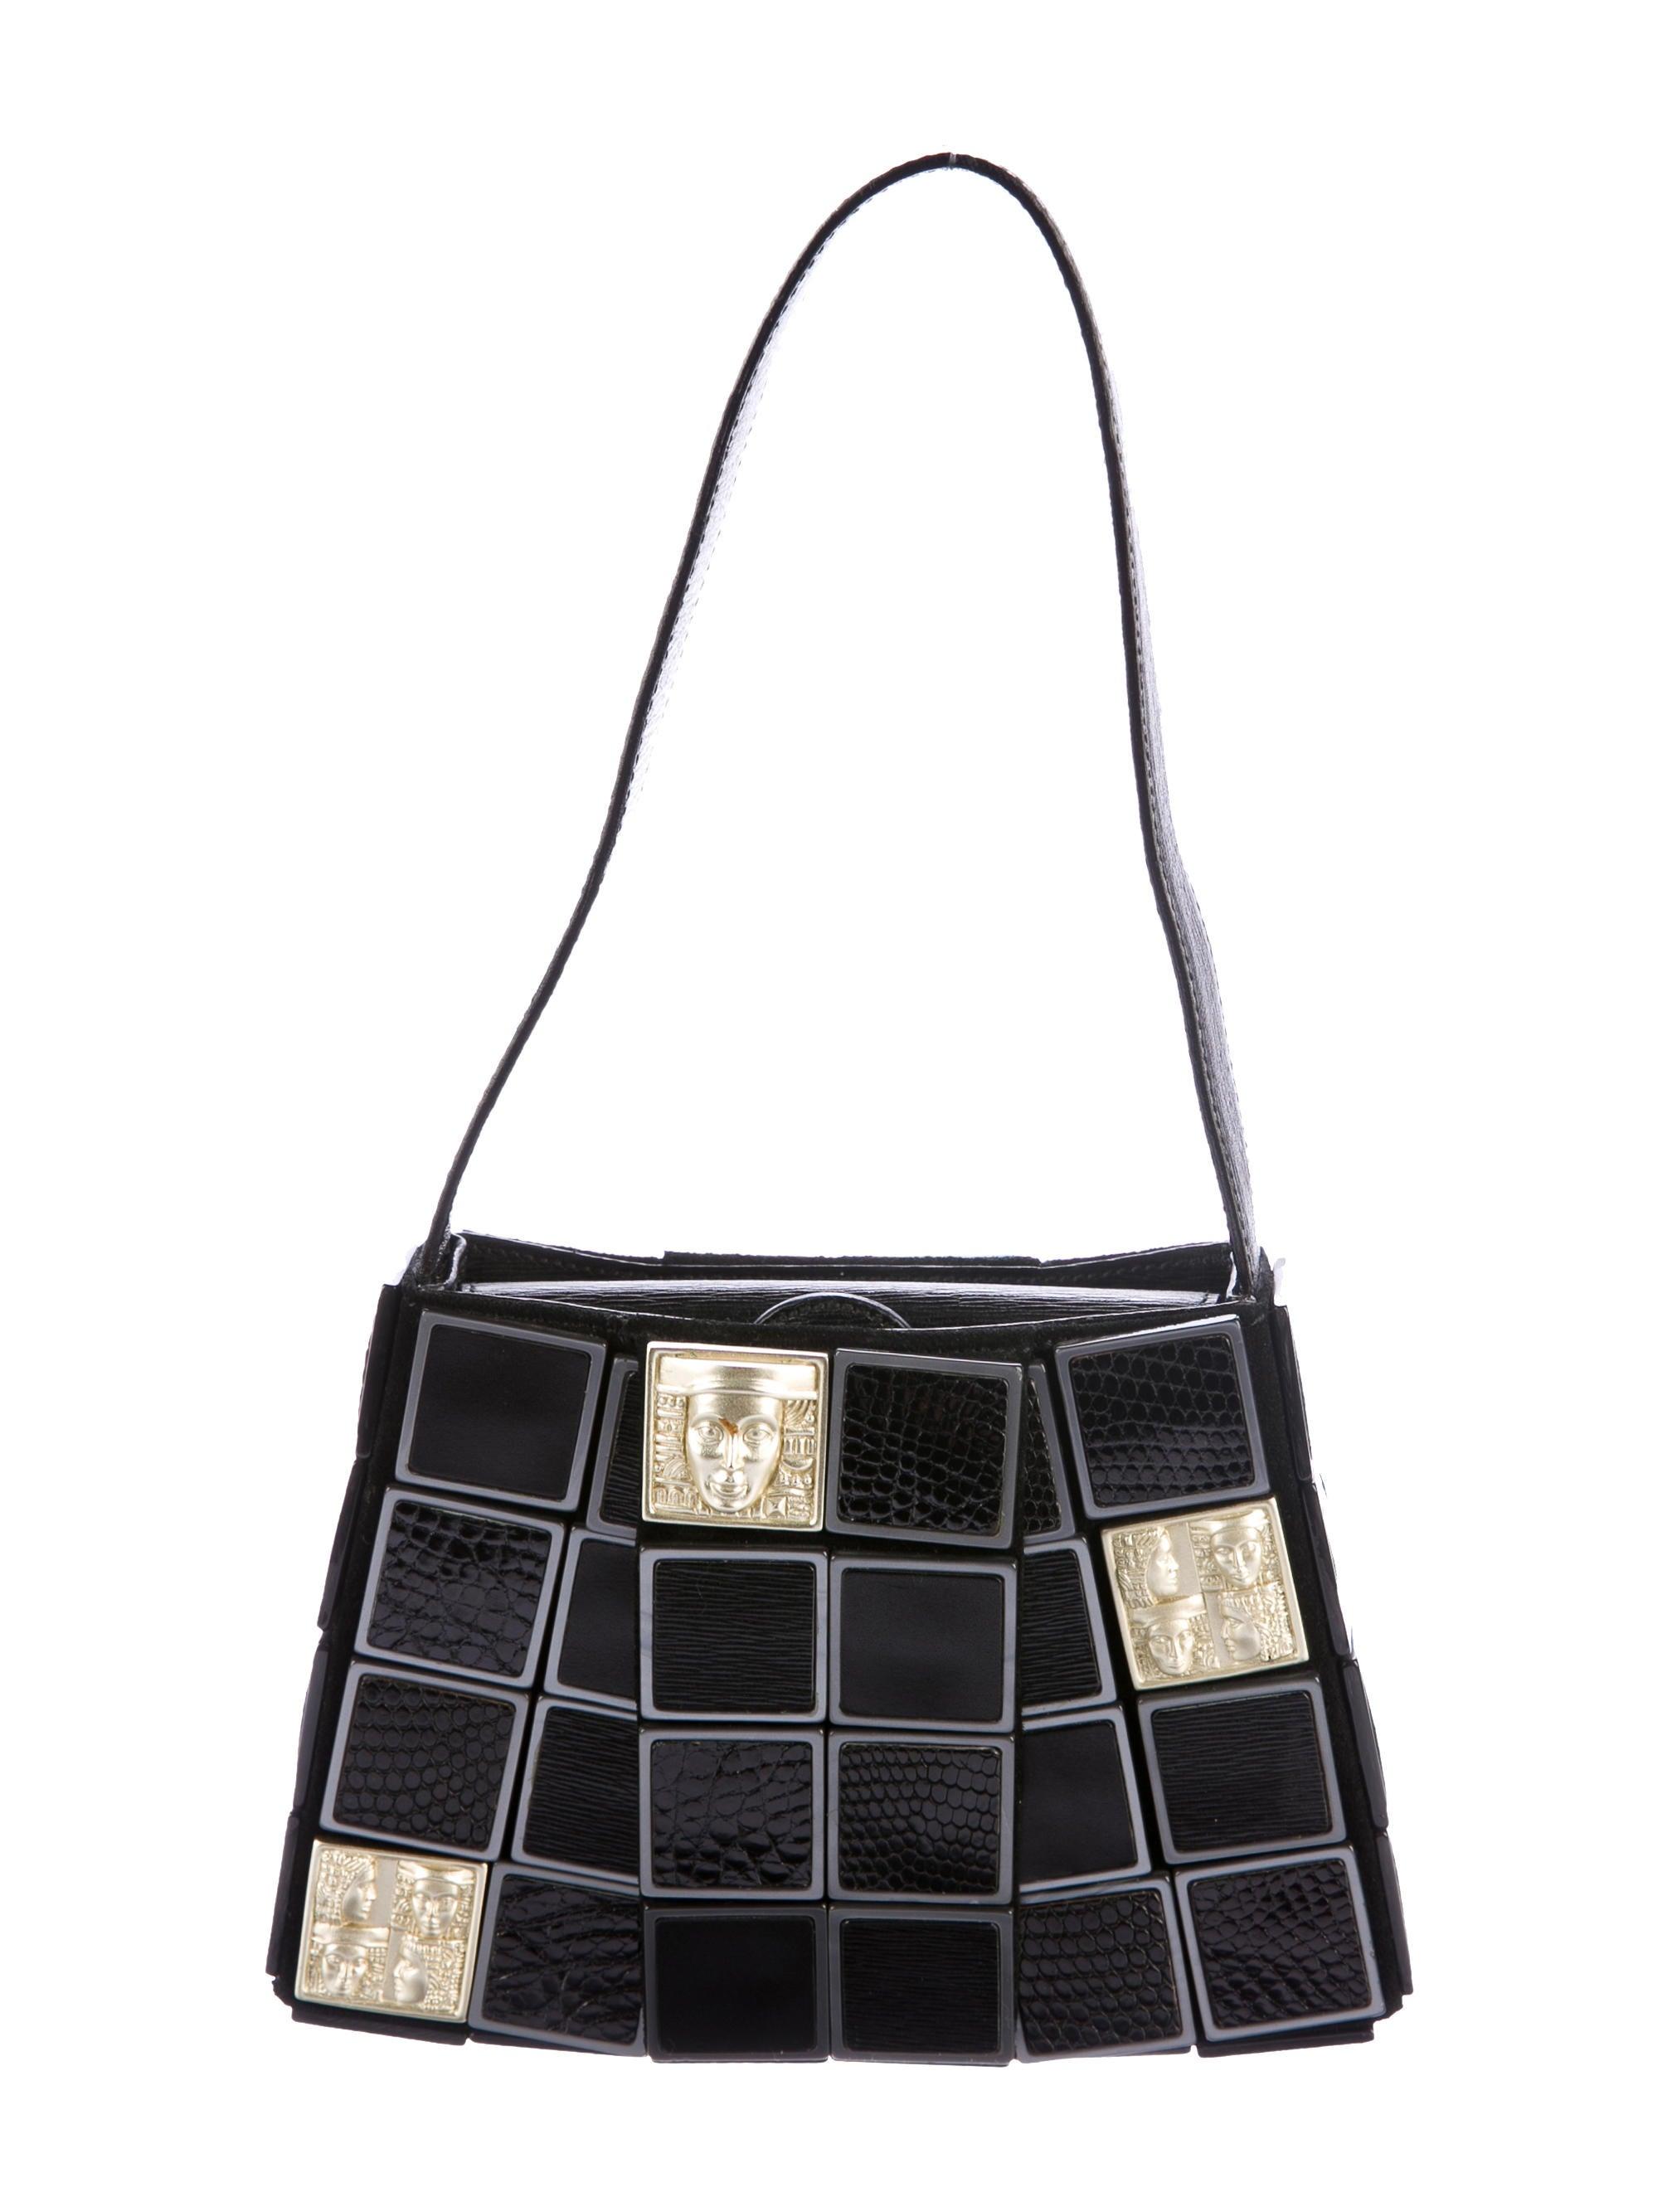 Kieselstein Cord Lizard Crocodile Accented Women Of The World Tiles Bag Handbags Bkc22551